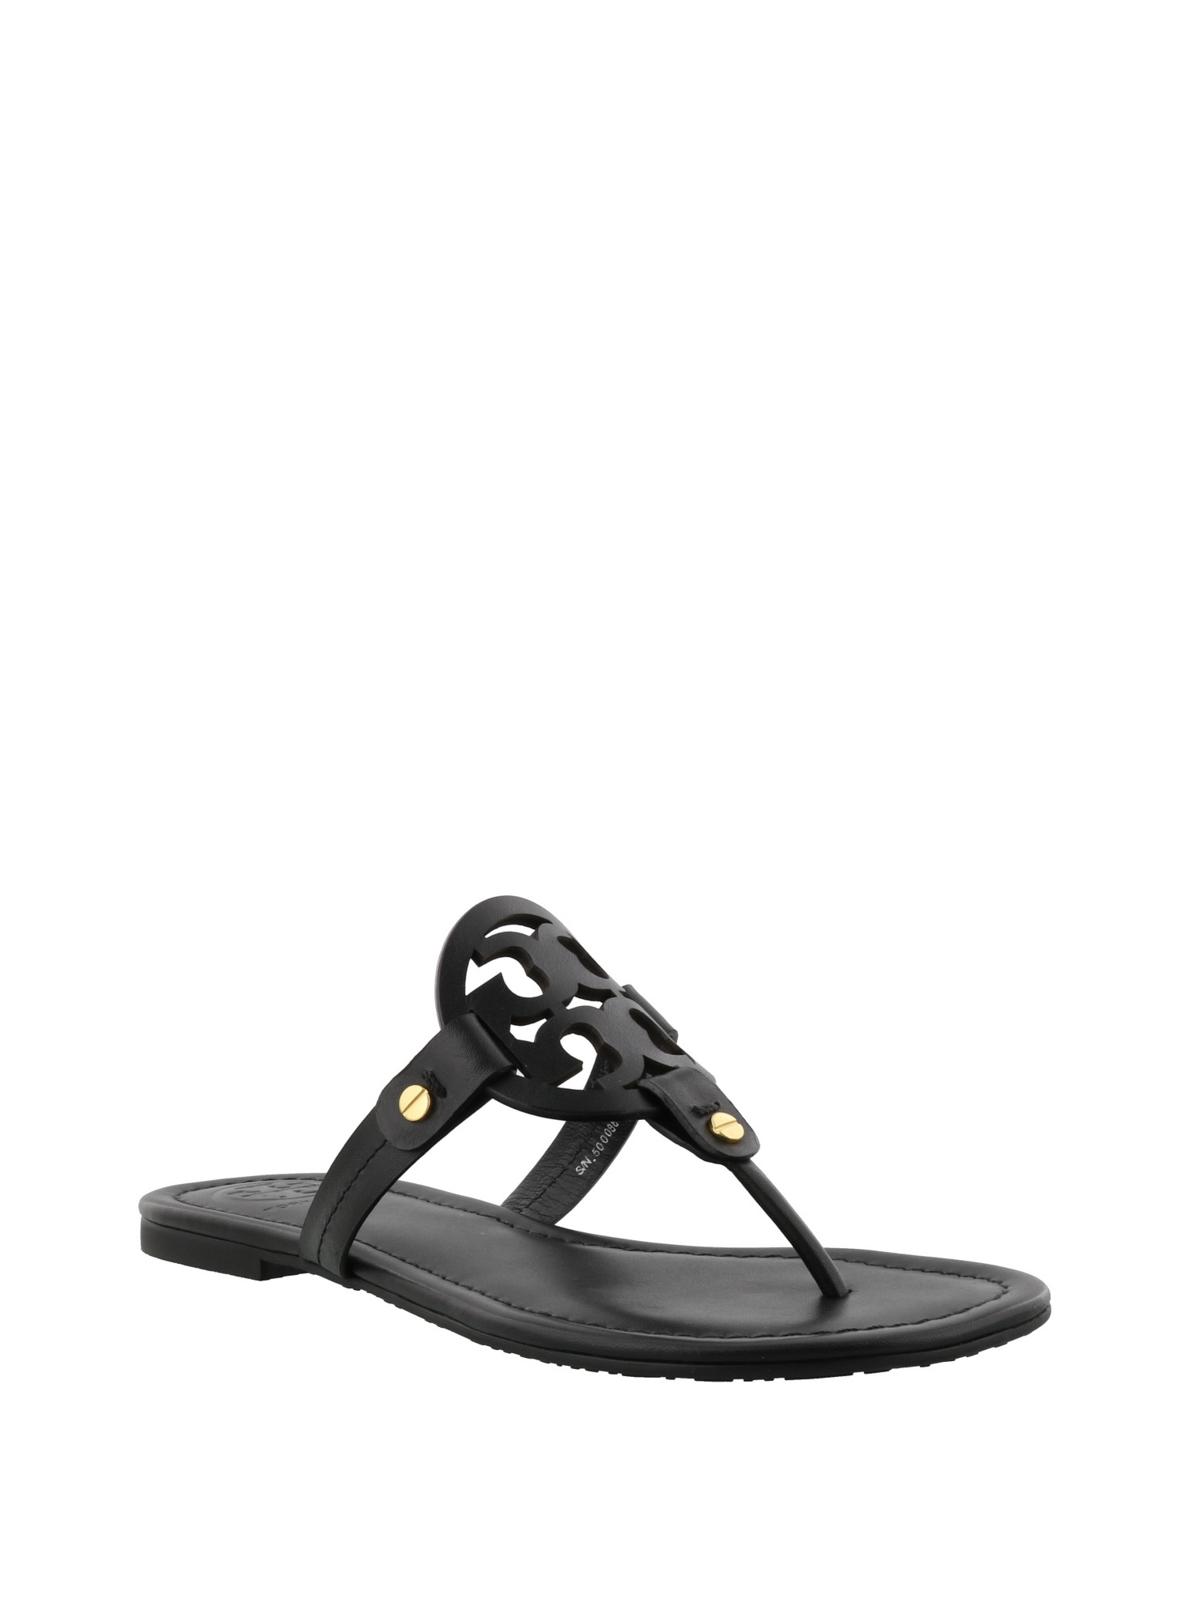 b7e93d49415f TORY BURCH  flip flops online - Miller black leather thong sandals